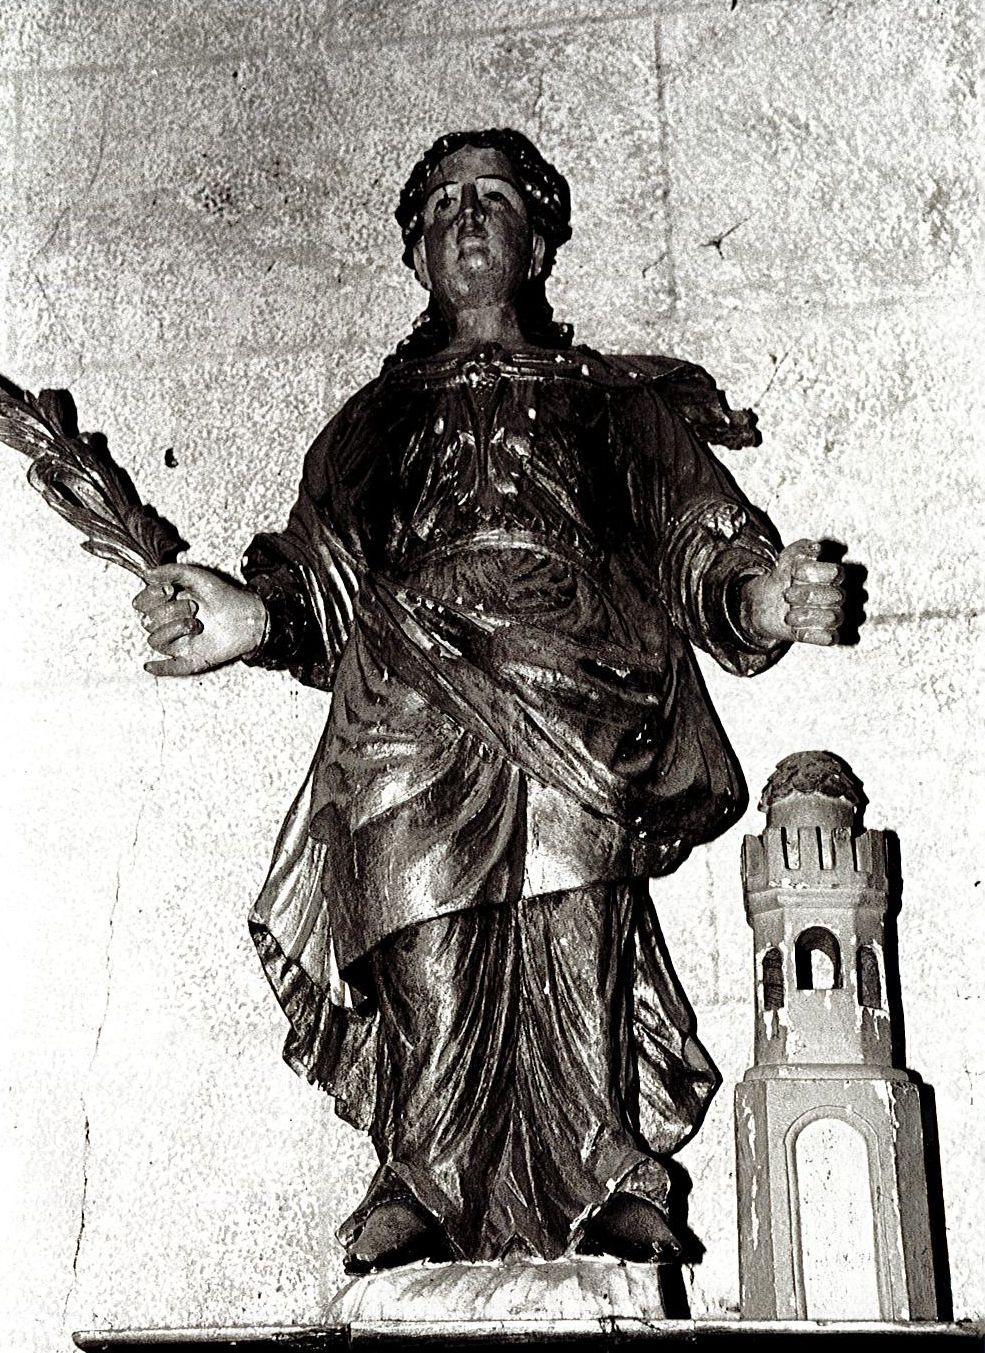 Statue : Sainte Barbe et sa tour